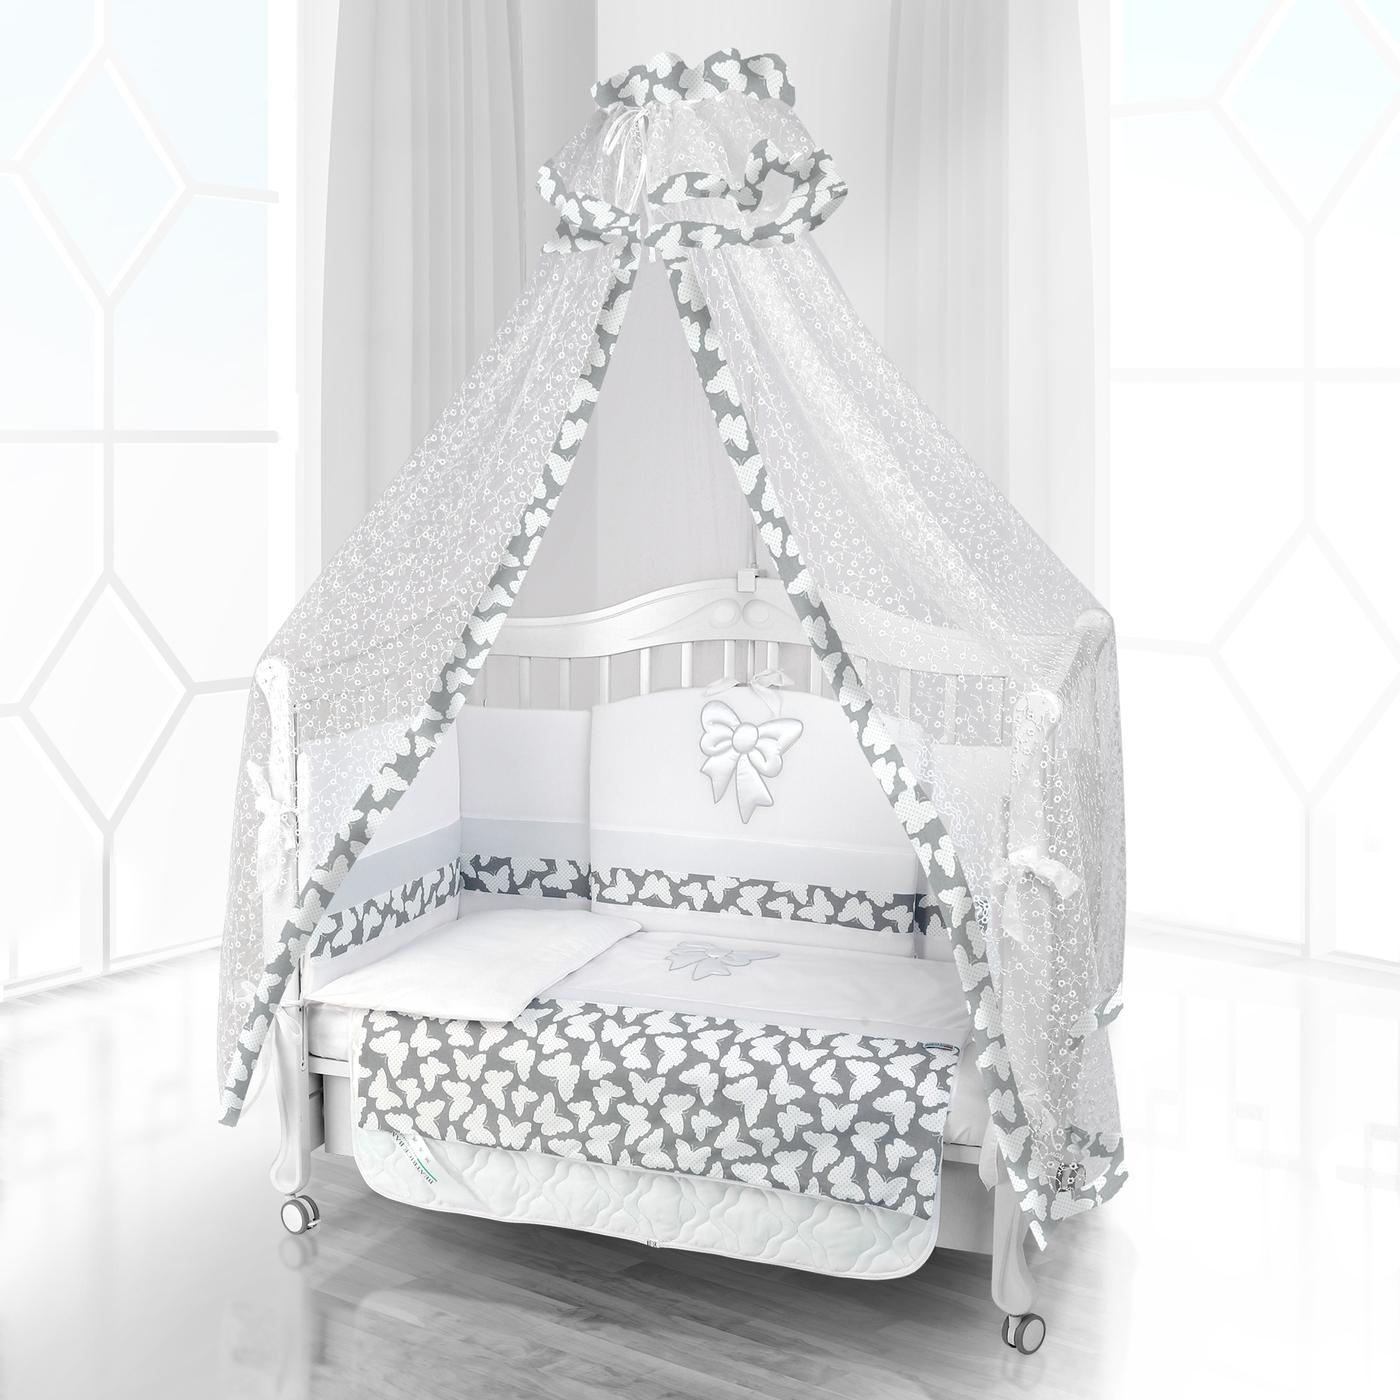 Комплект постельного белья Beatrice Bambini Unico Farfalino (120х60) - bianco& grigio